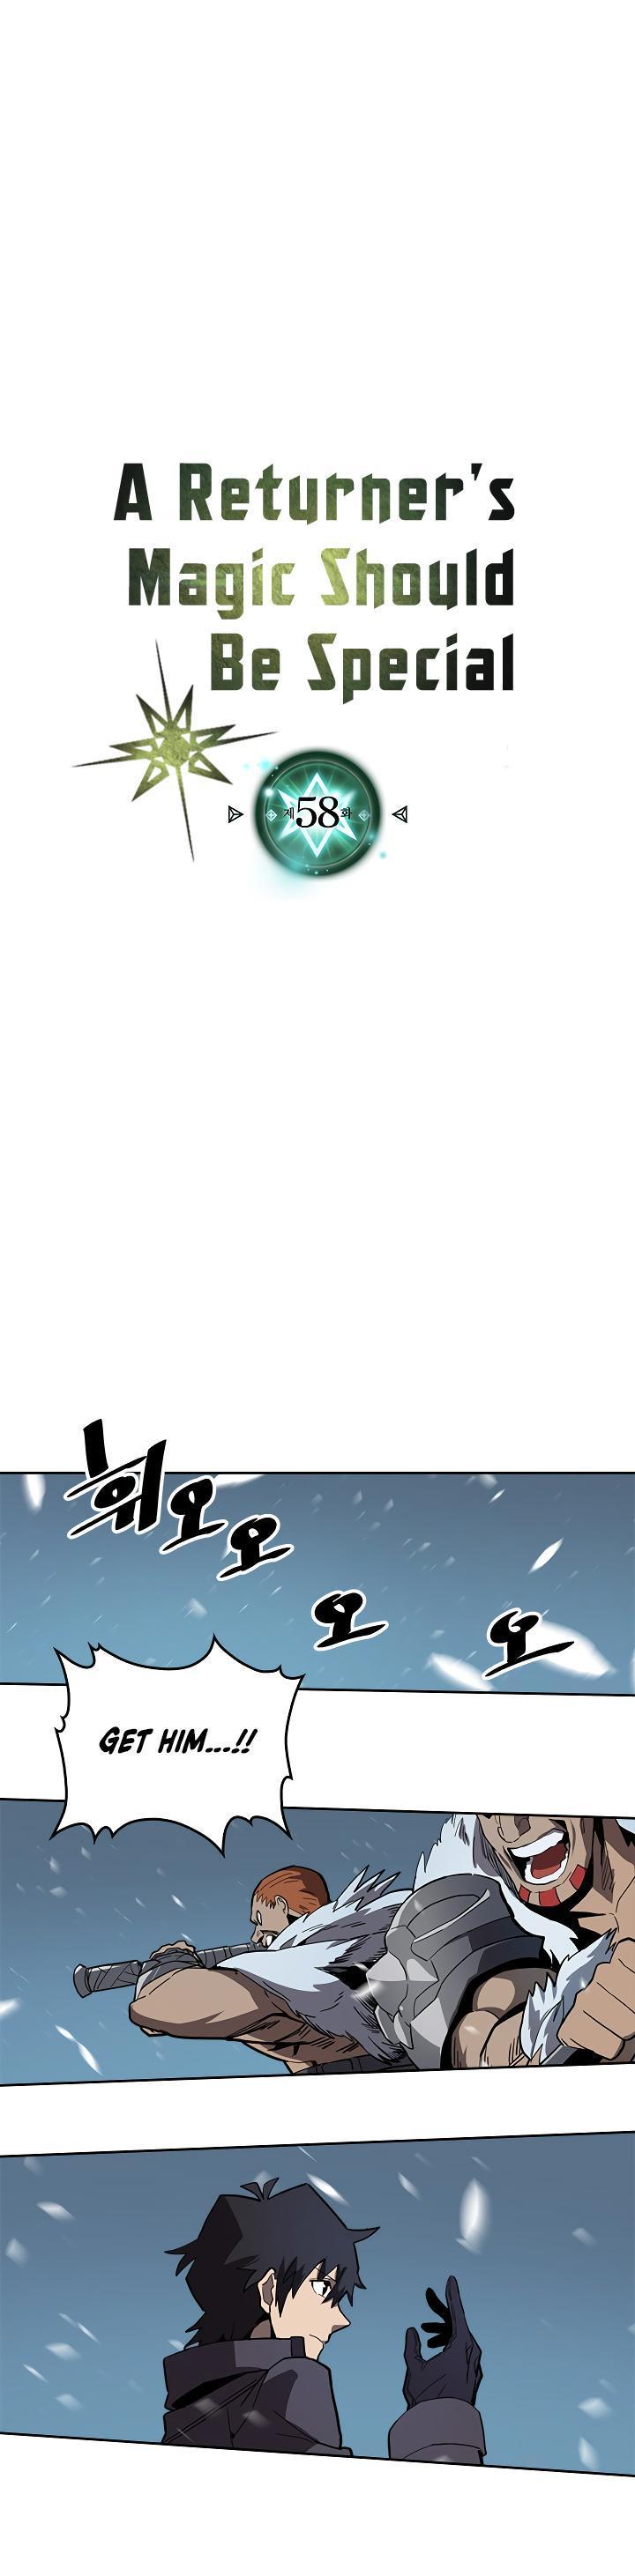 A Returner's Magic Should Be Special Chapter 58 page 4 - Mangakakalots.com